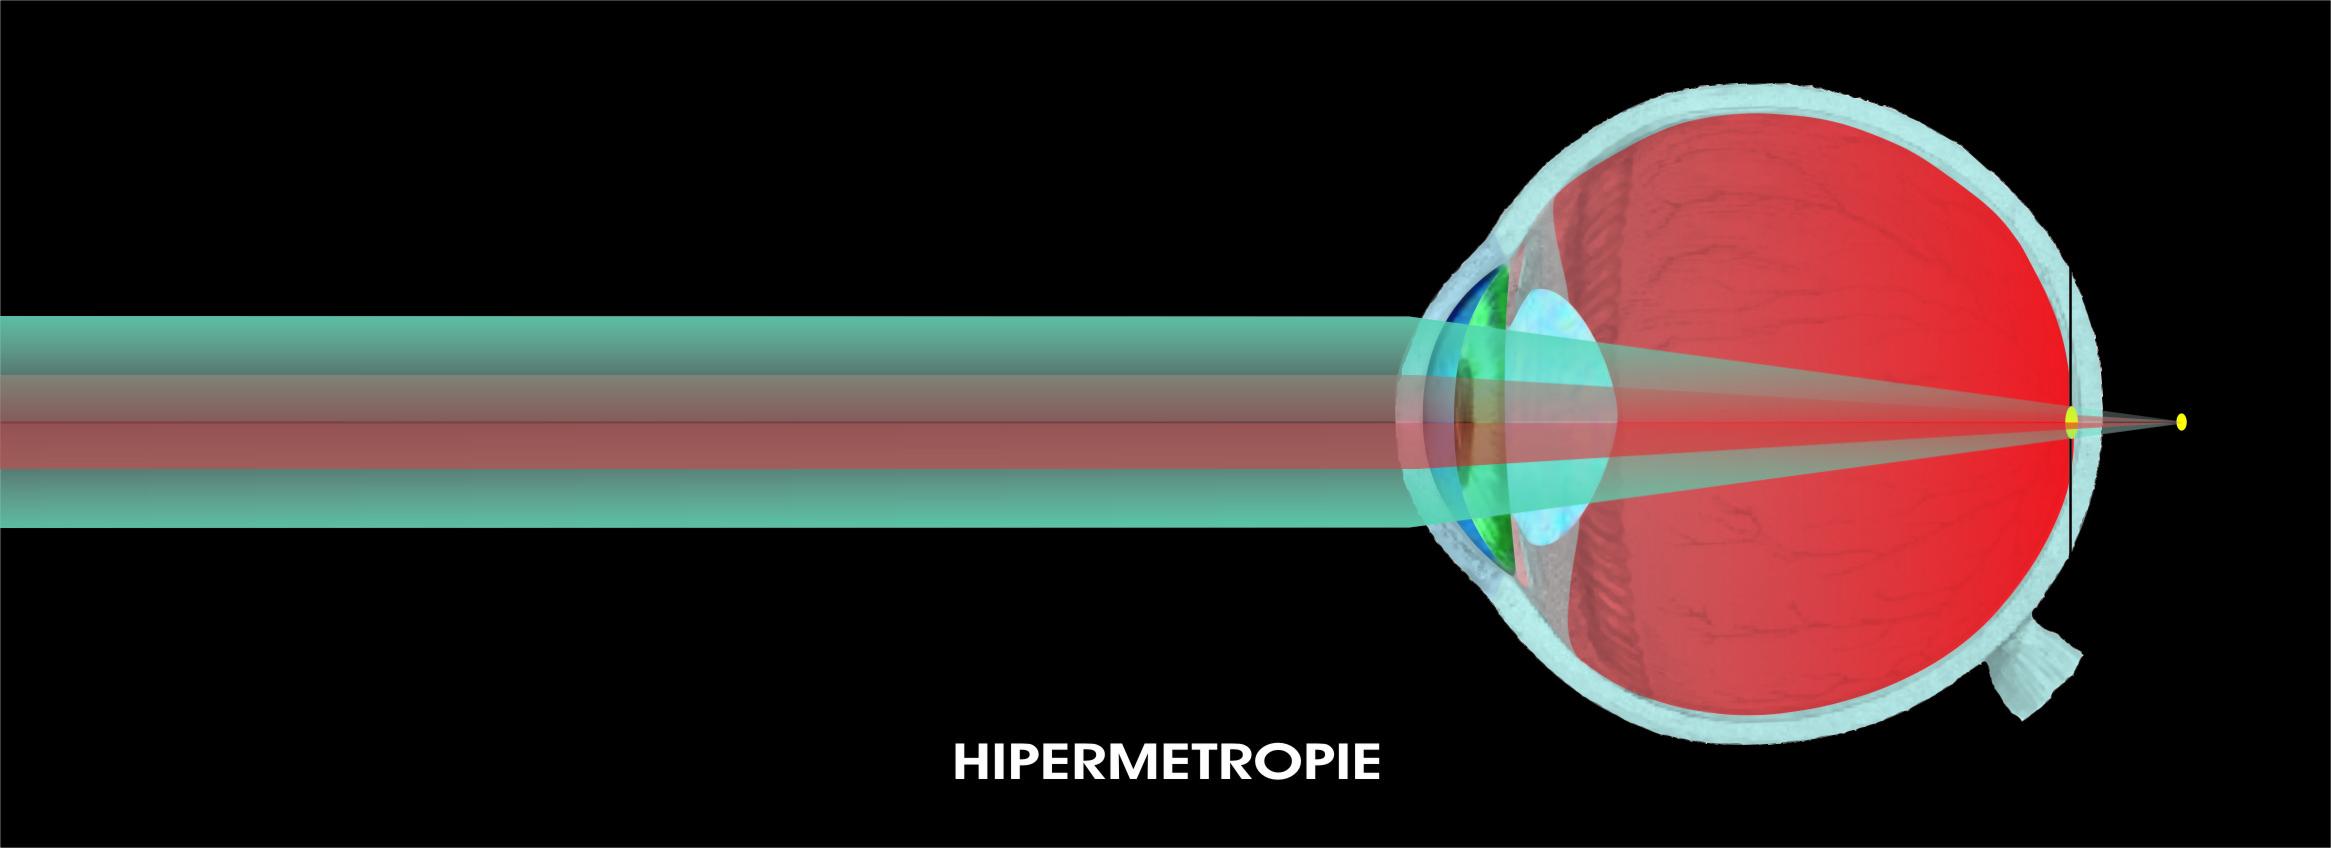 Hipermetropia: Cauze, simptome, tratament